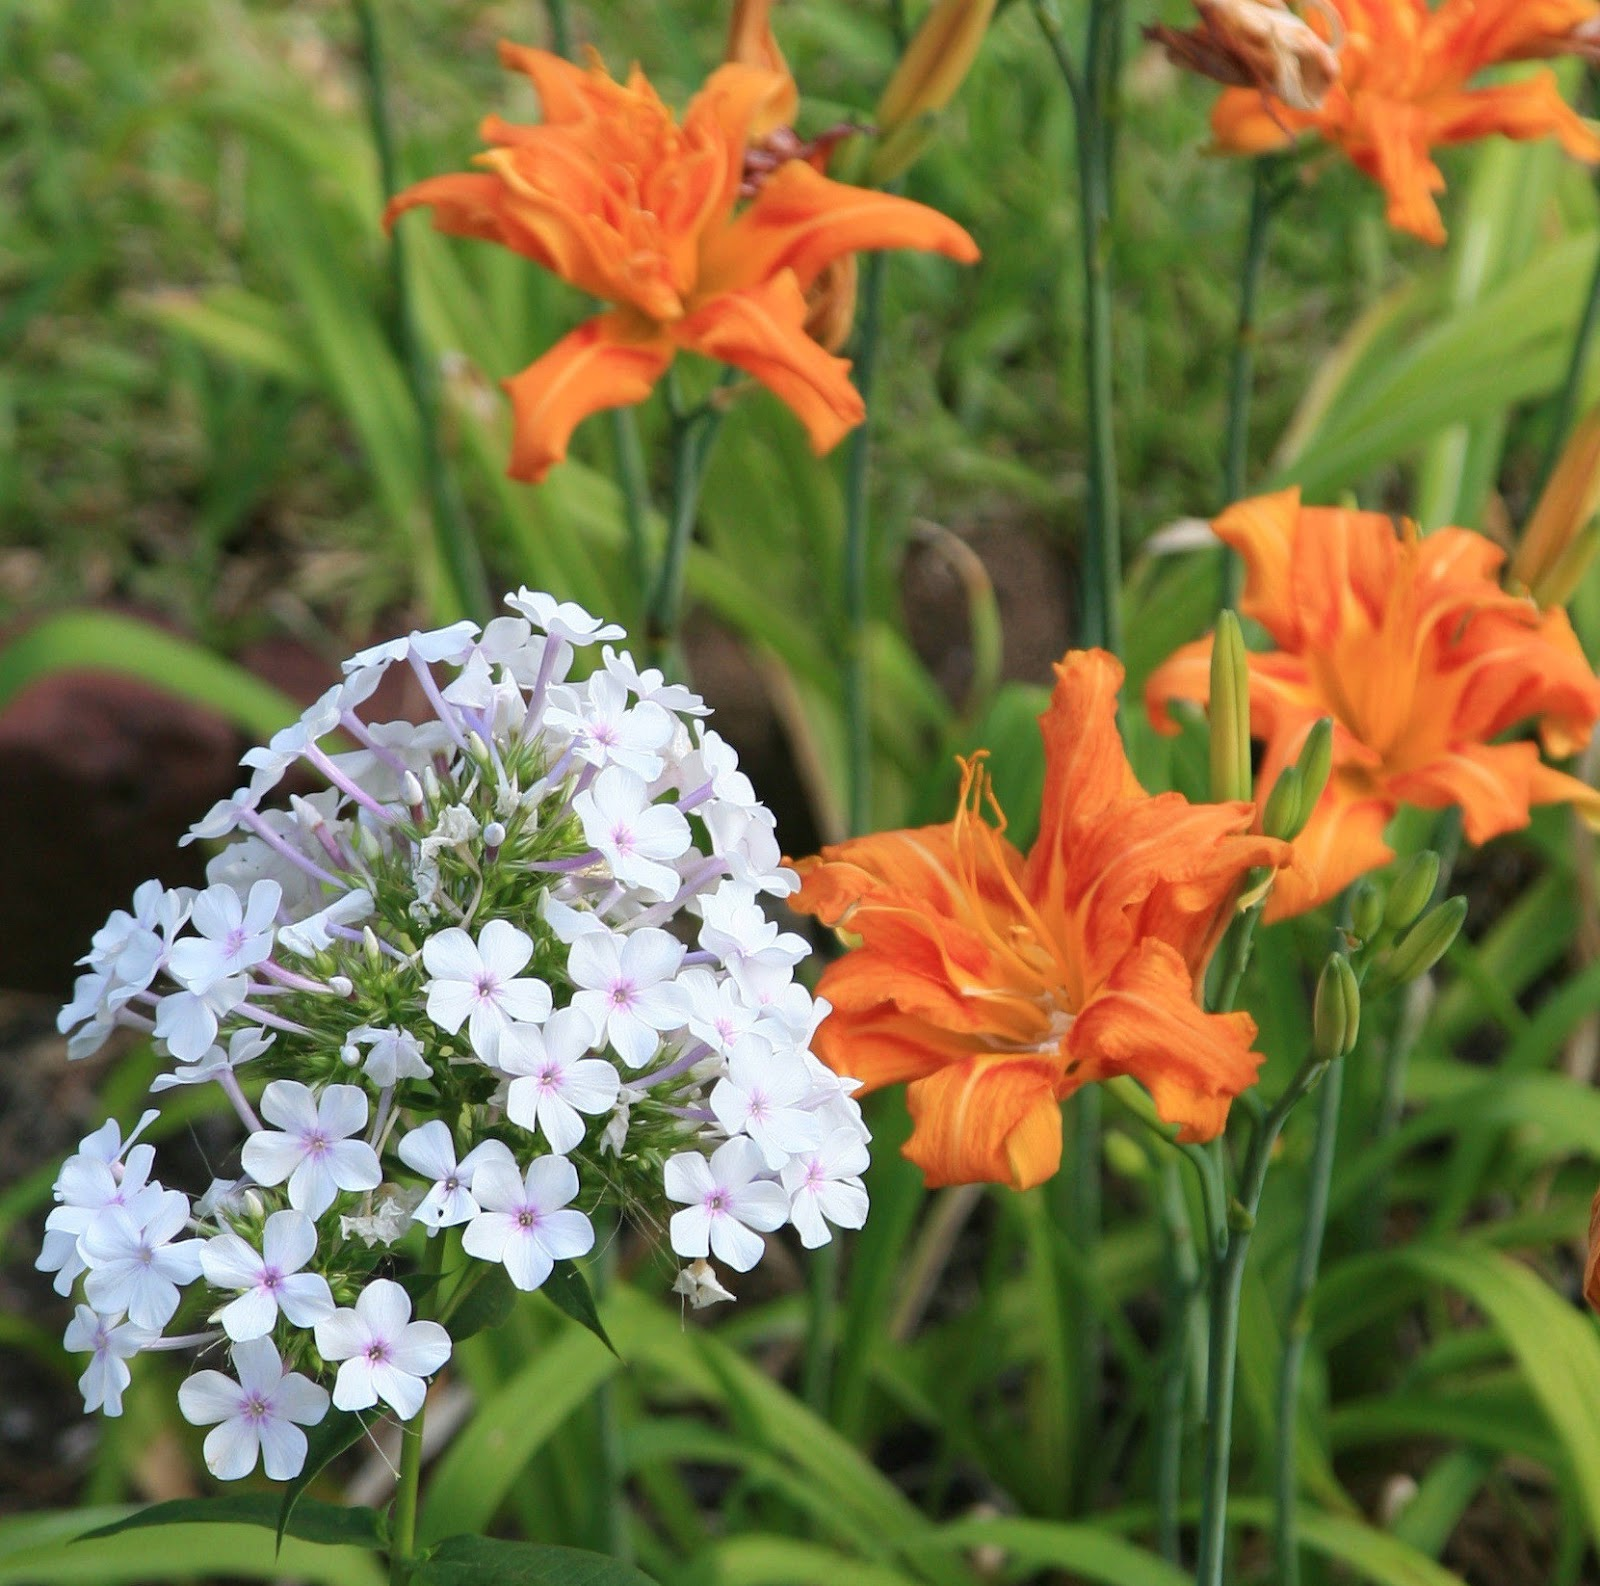 slides 38 41 garden phlox p paniculata usda hardiness zones 2 8